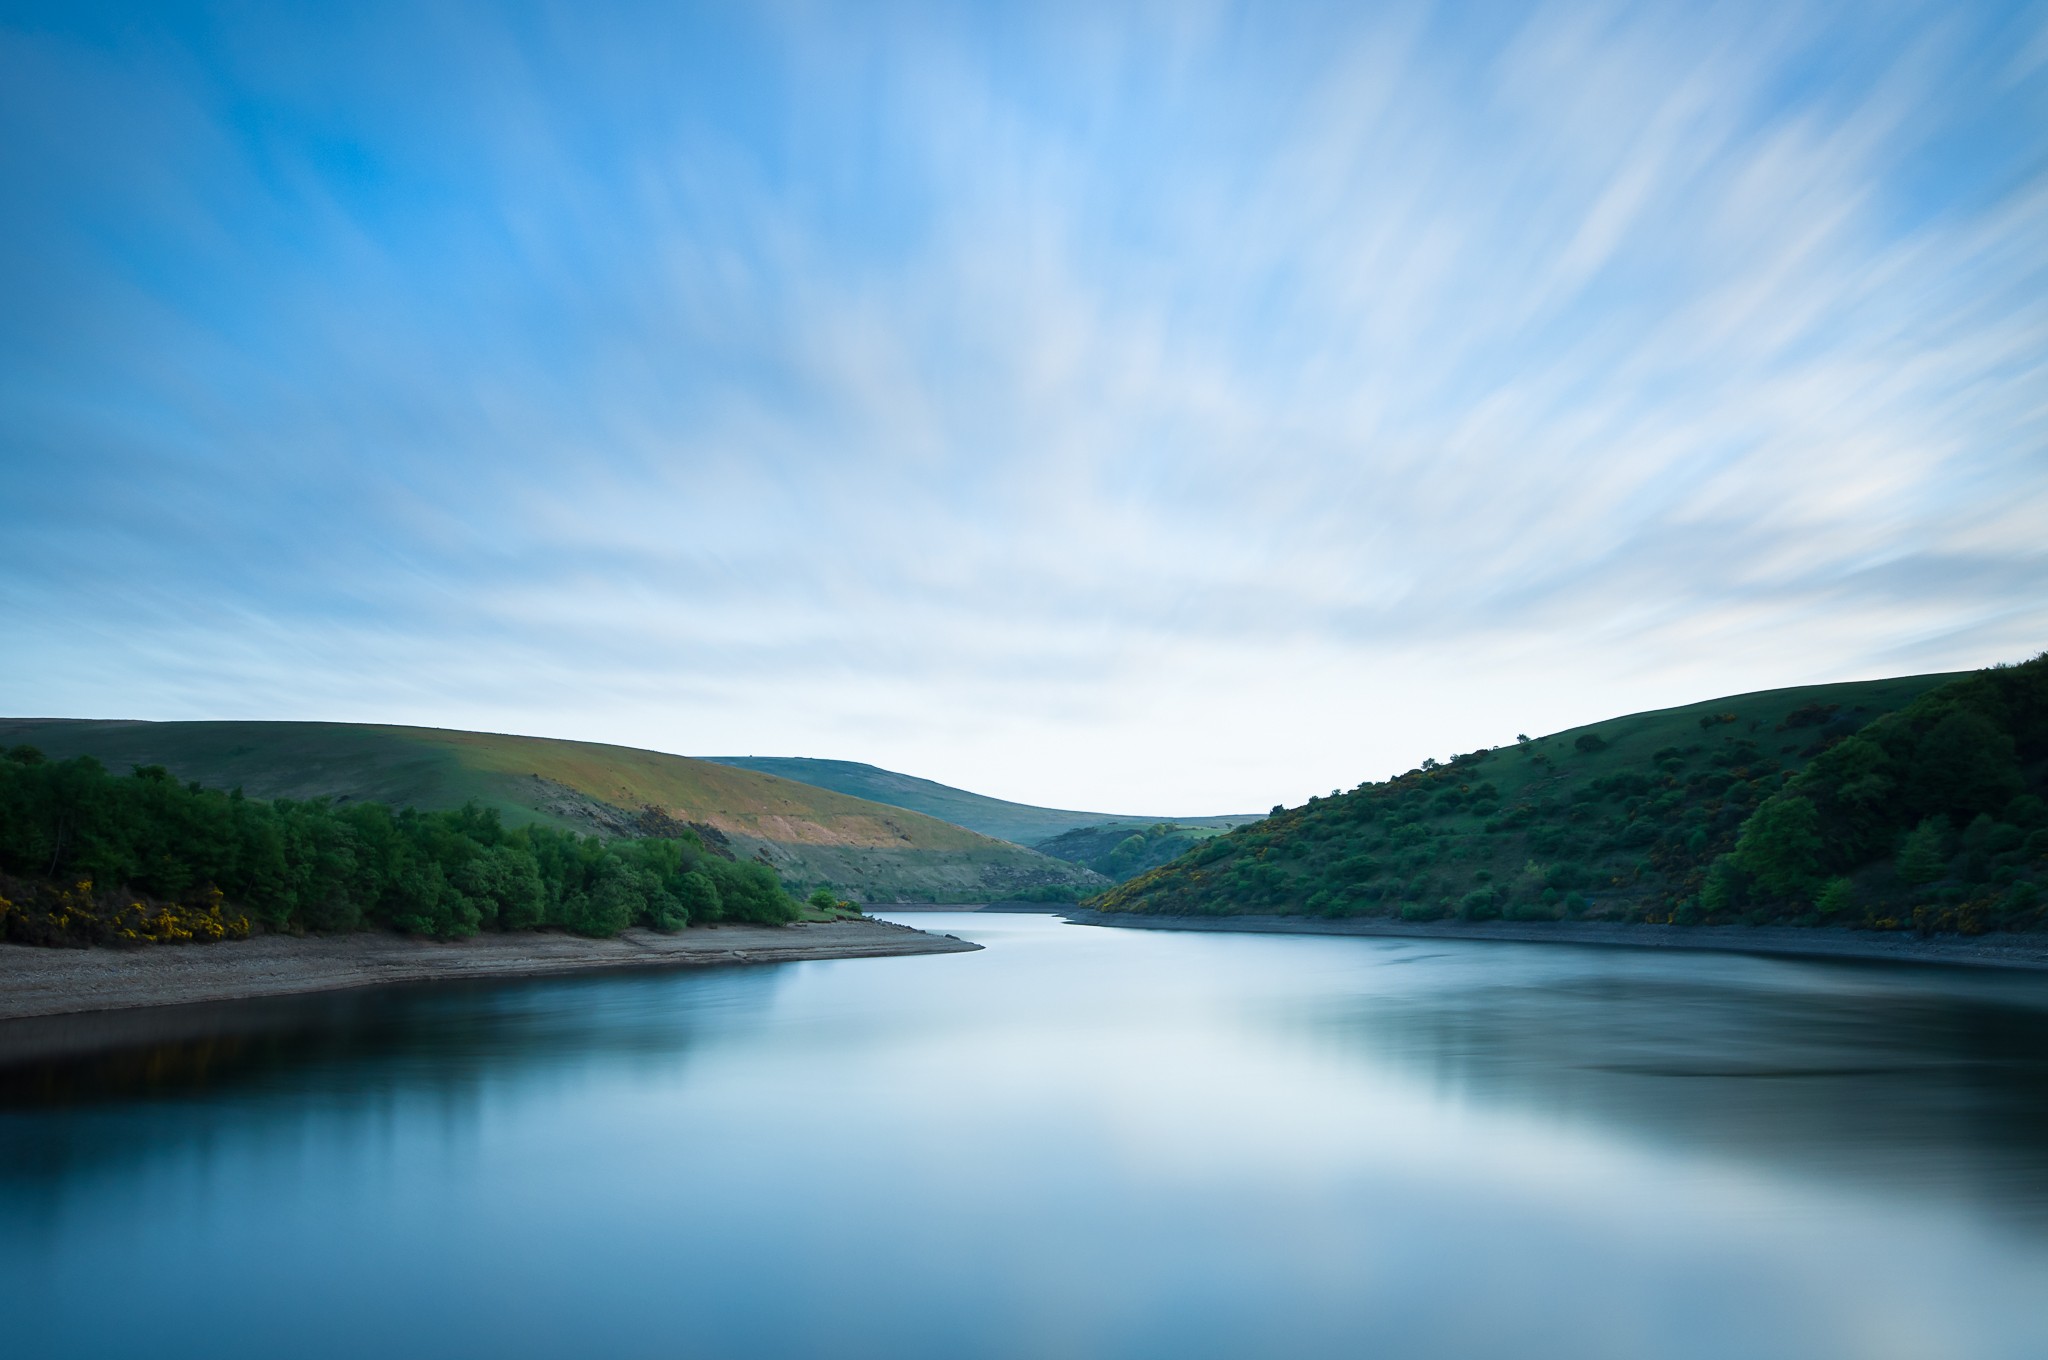 Serenity at Meldon Reservoir